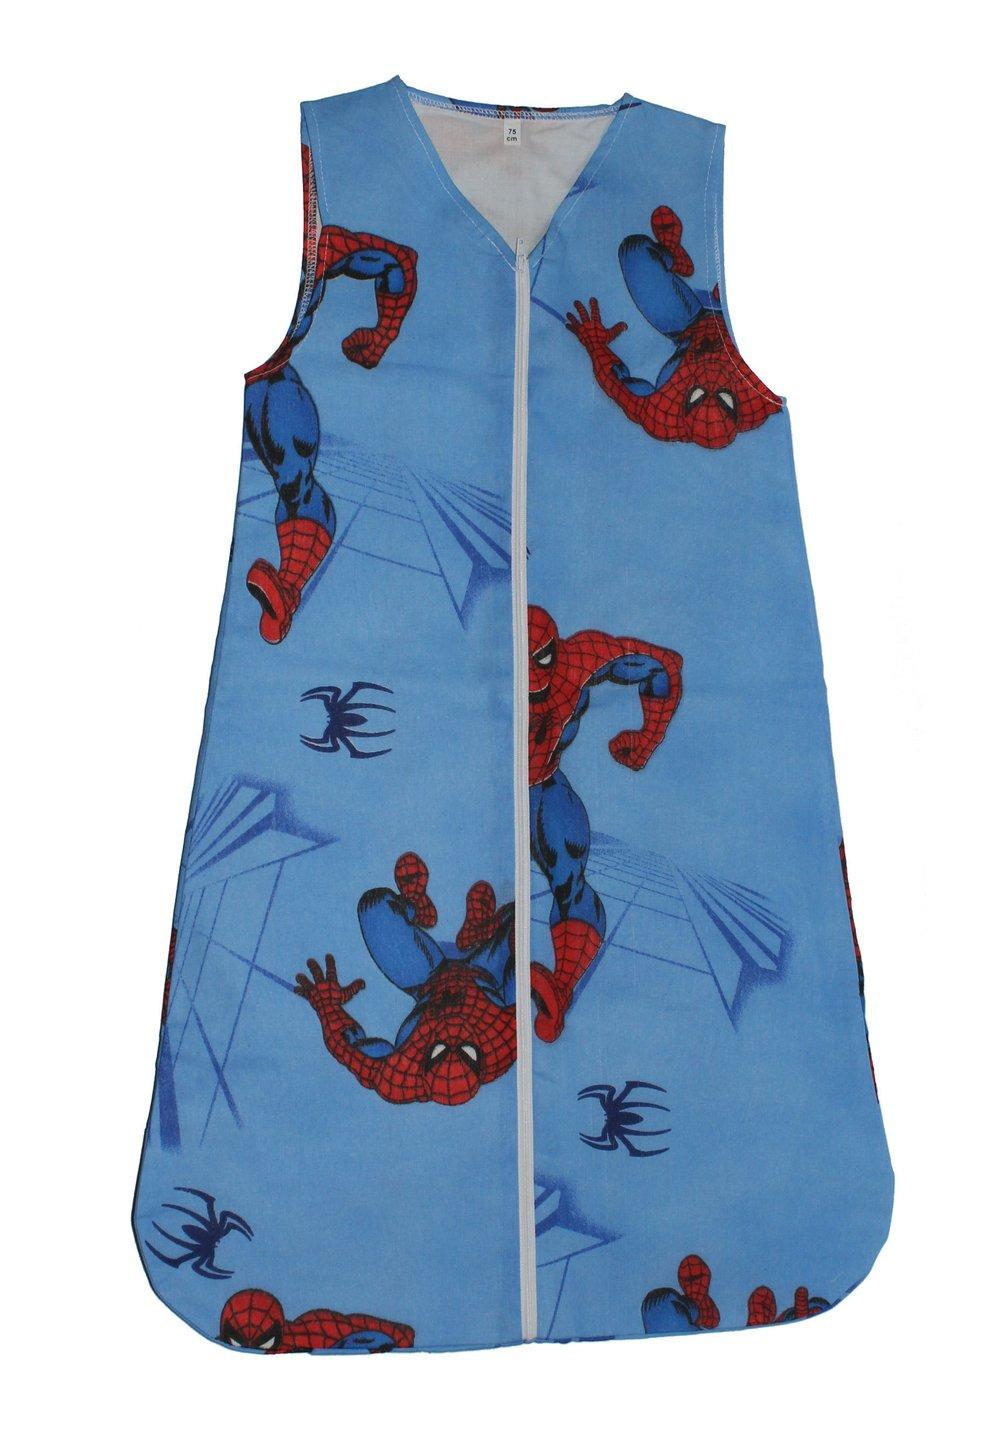 Sac de dormit vara Spider-Man albastru imagine